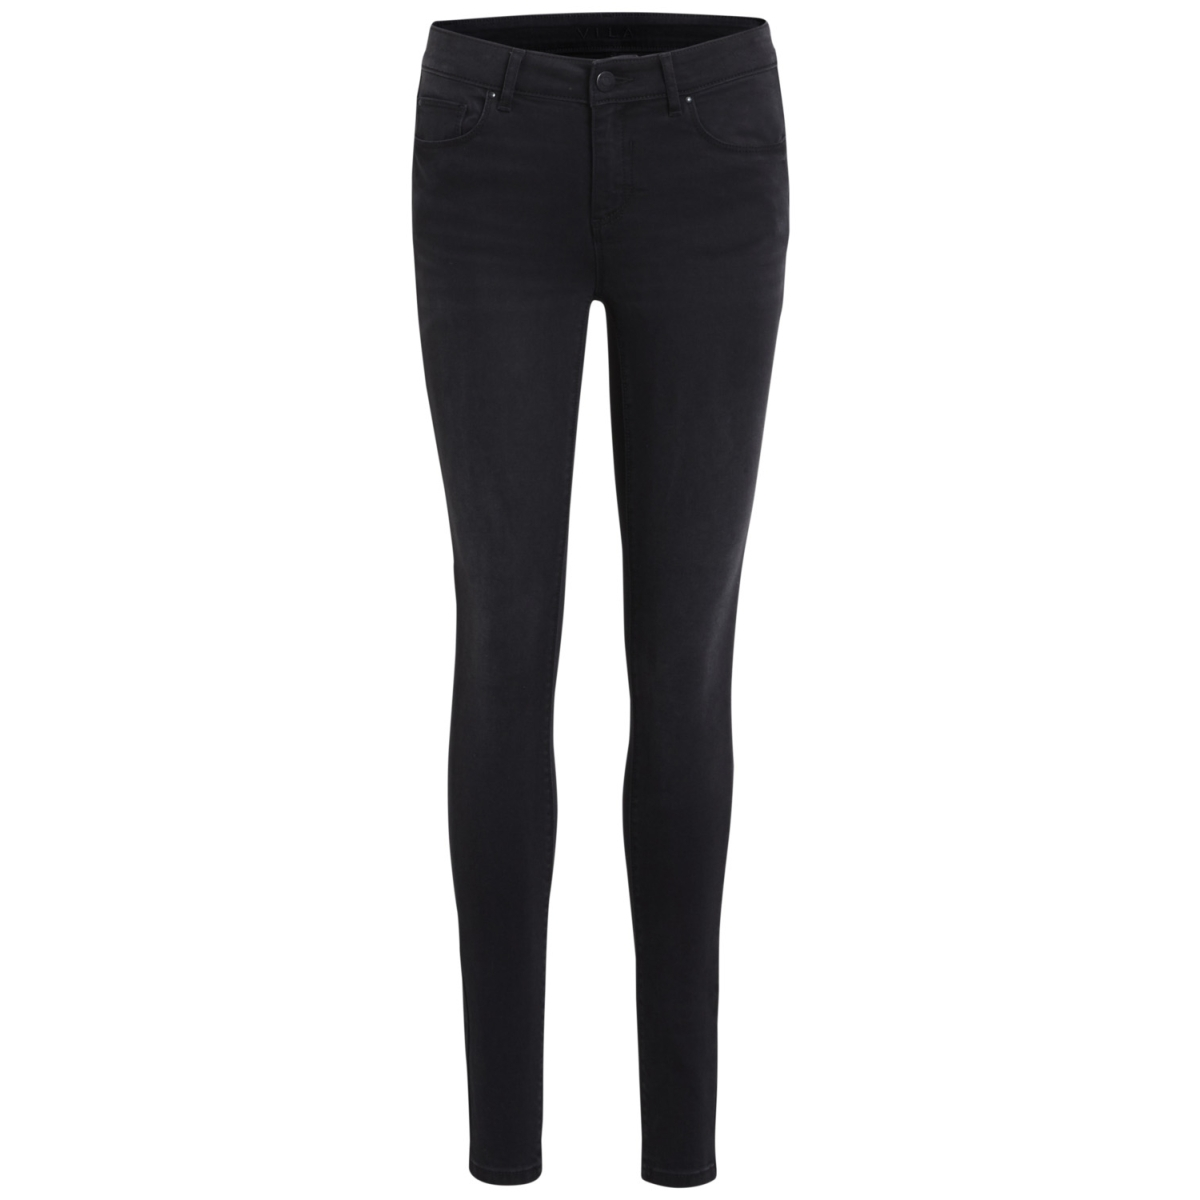 vicommit rw slim grey-noos 14042594 vila jeans grey denim